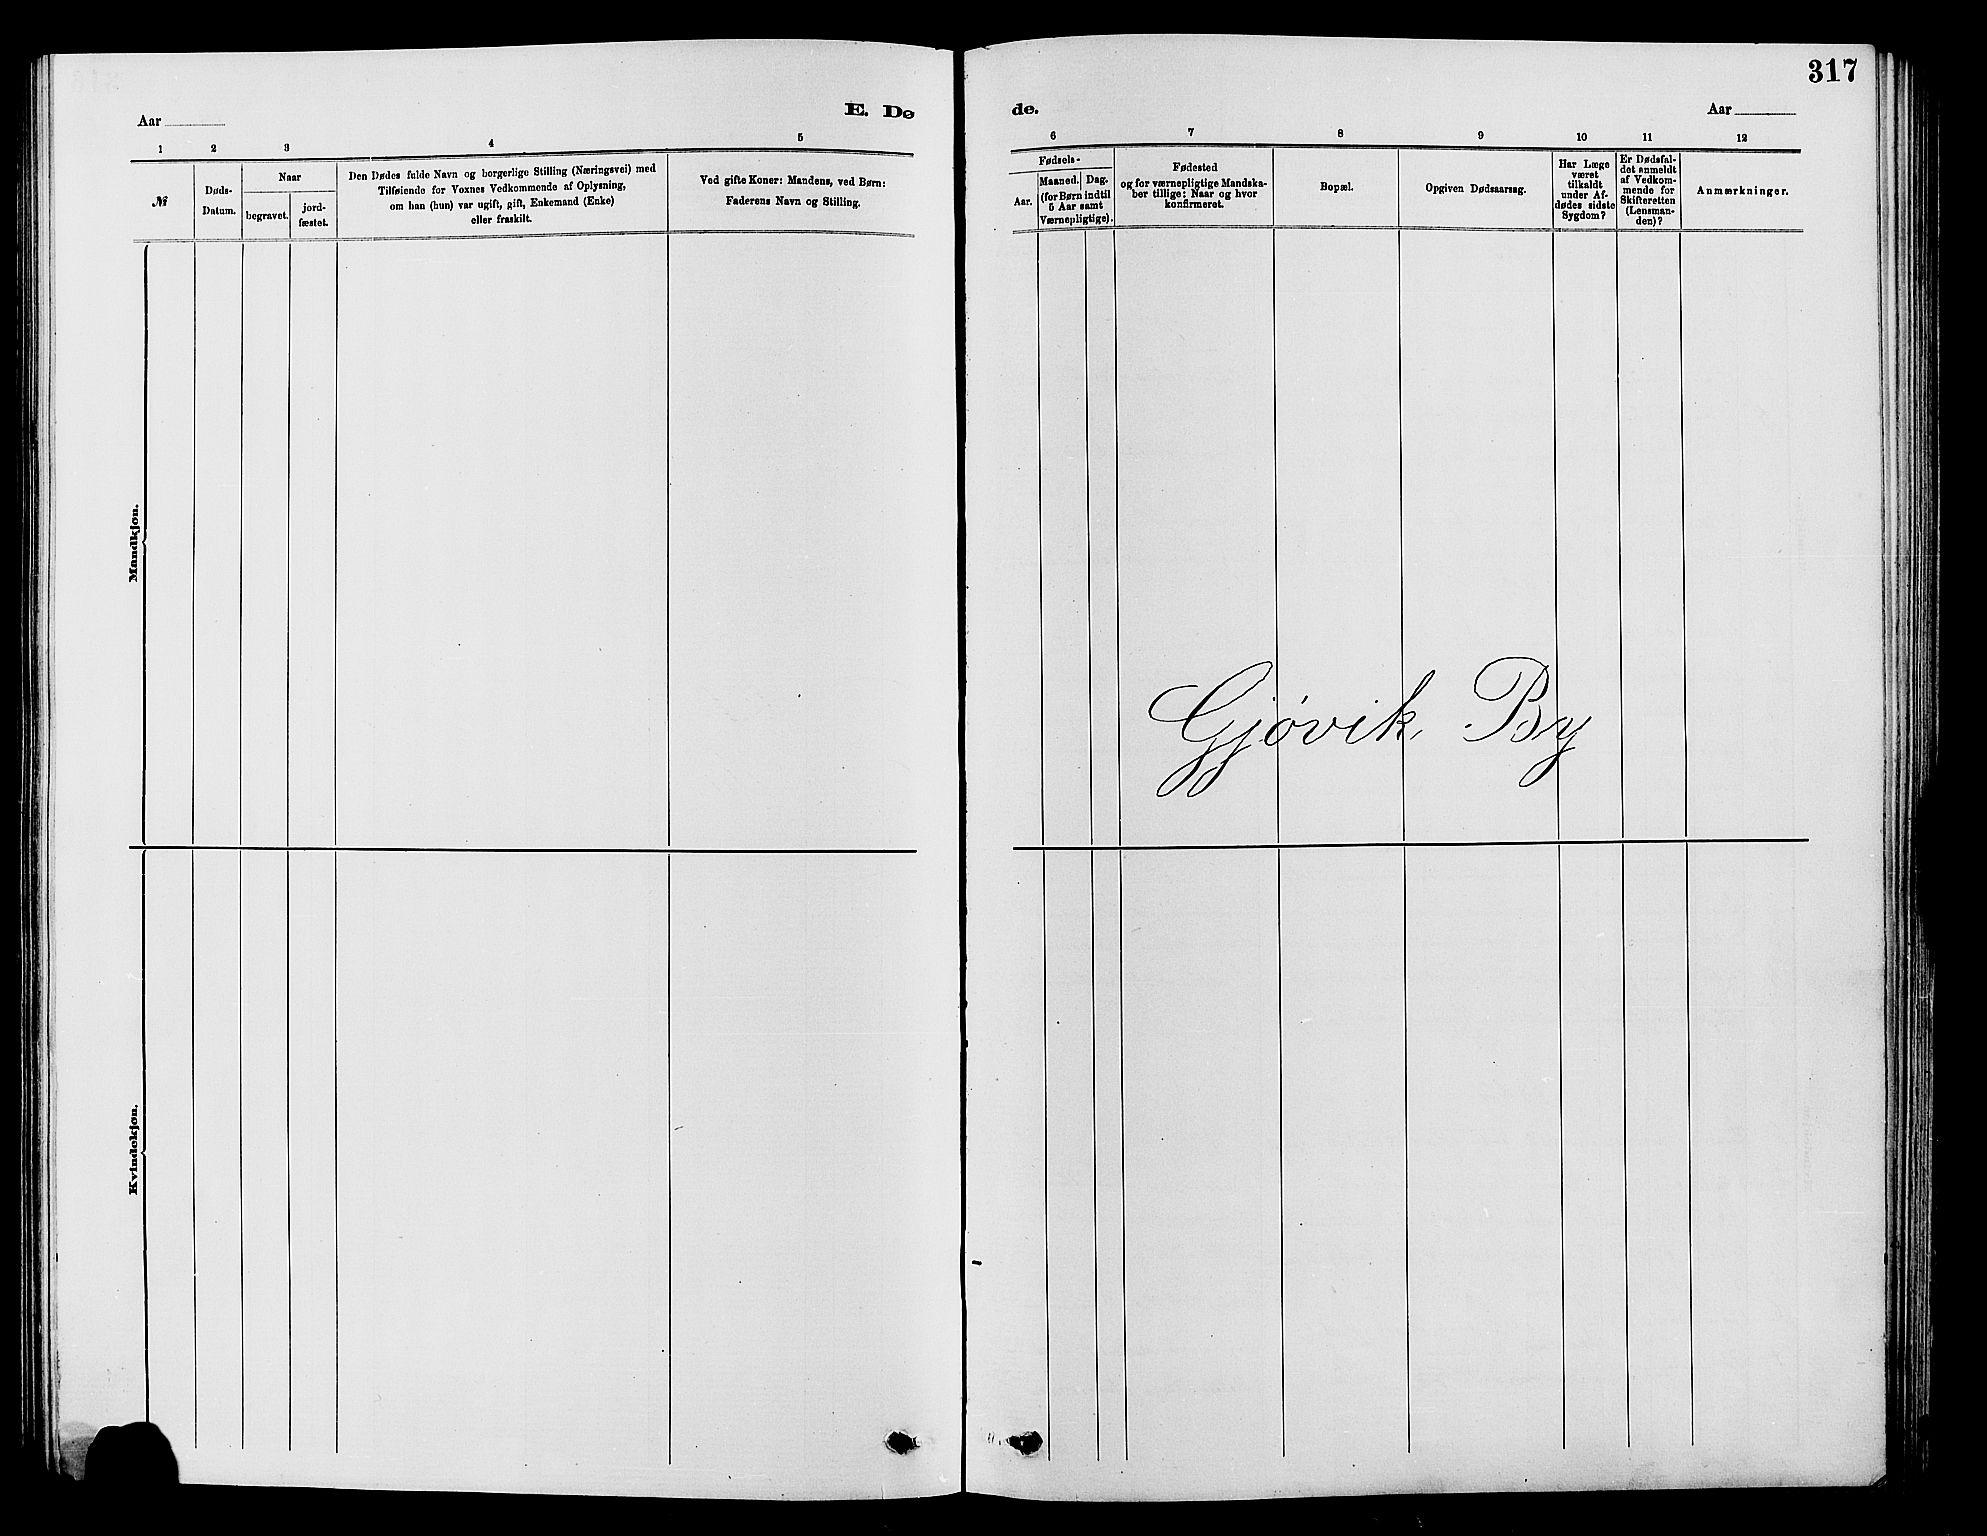 SAH, Vardal prestekontor, H/Ha/Hab/L0007: Klokkerbok nr. 7 /2, 1881-1895, s. 317